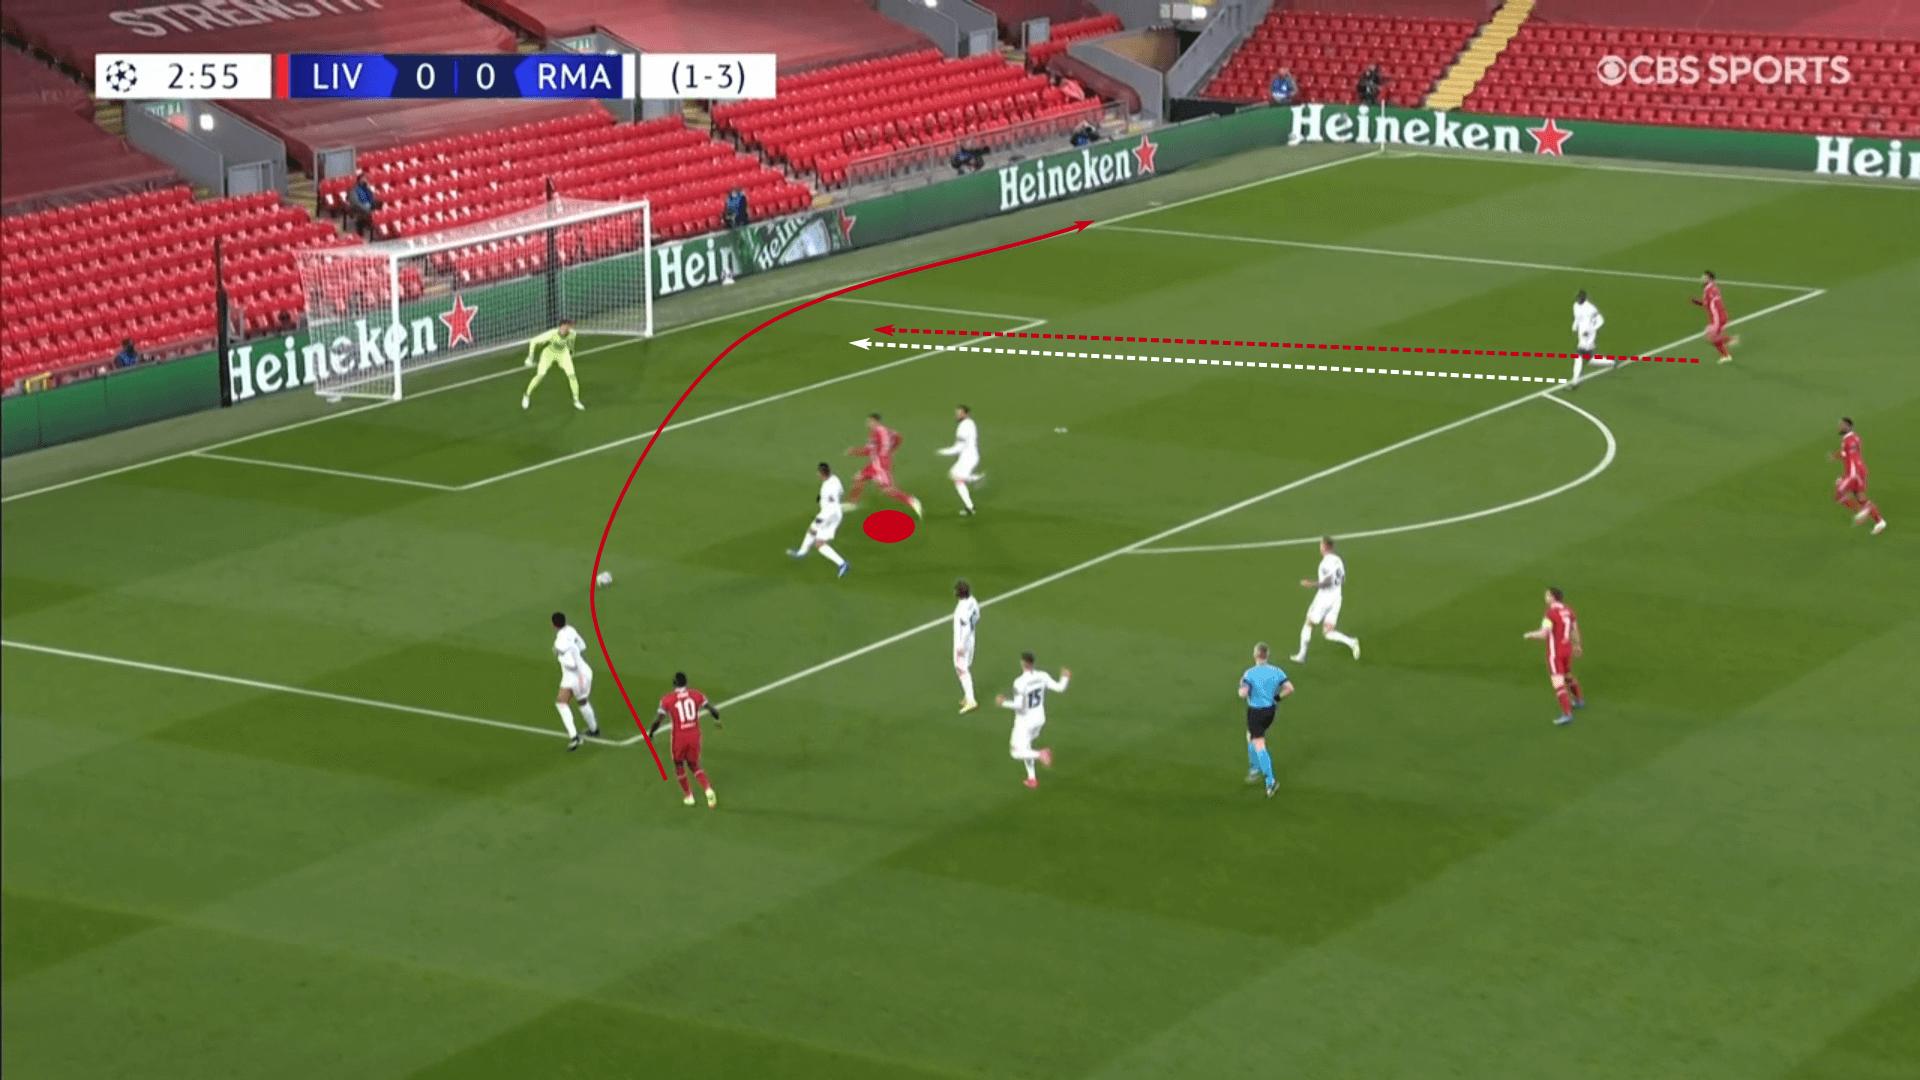 UEFA Champions League 2020/21: Liverpool vs Real Madrid – tactical analysis tactics